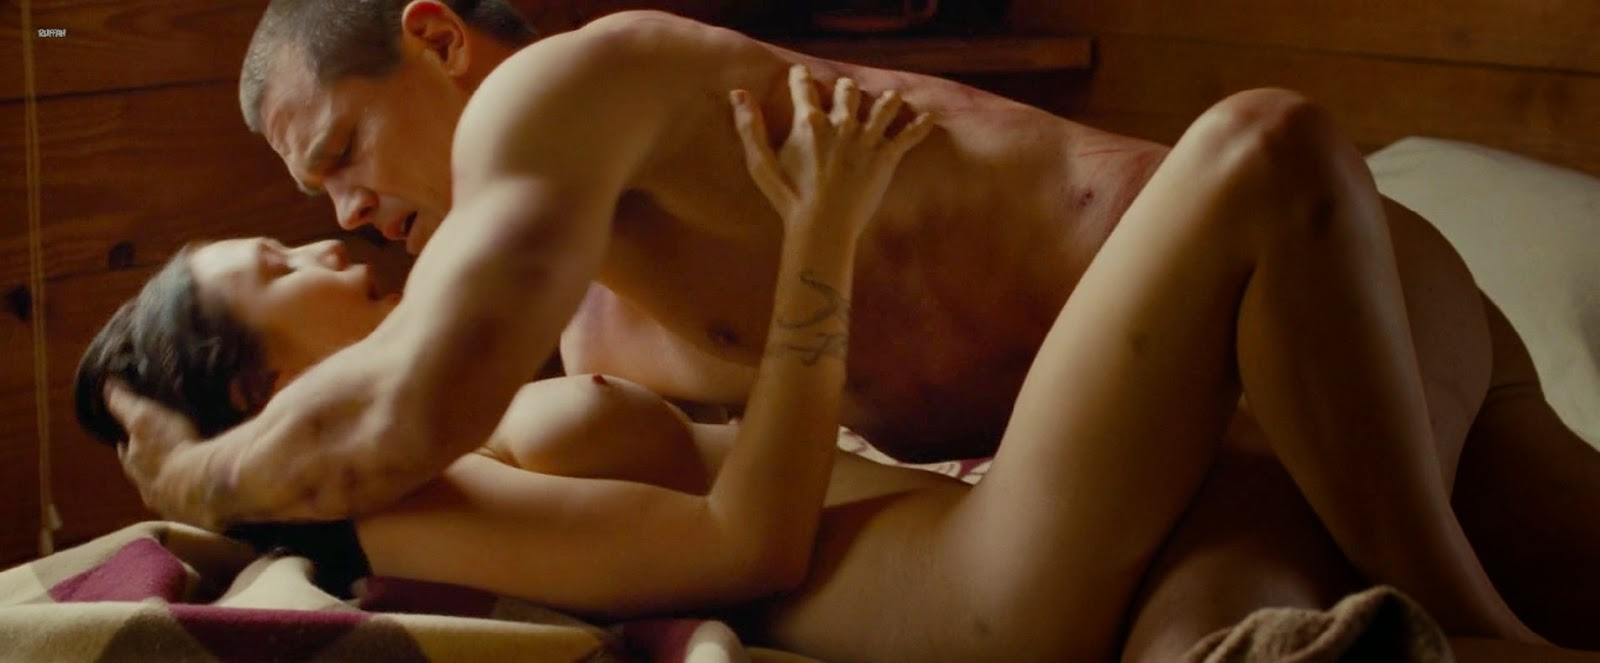 pleasure elizabeth olsen sex